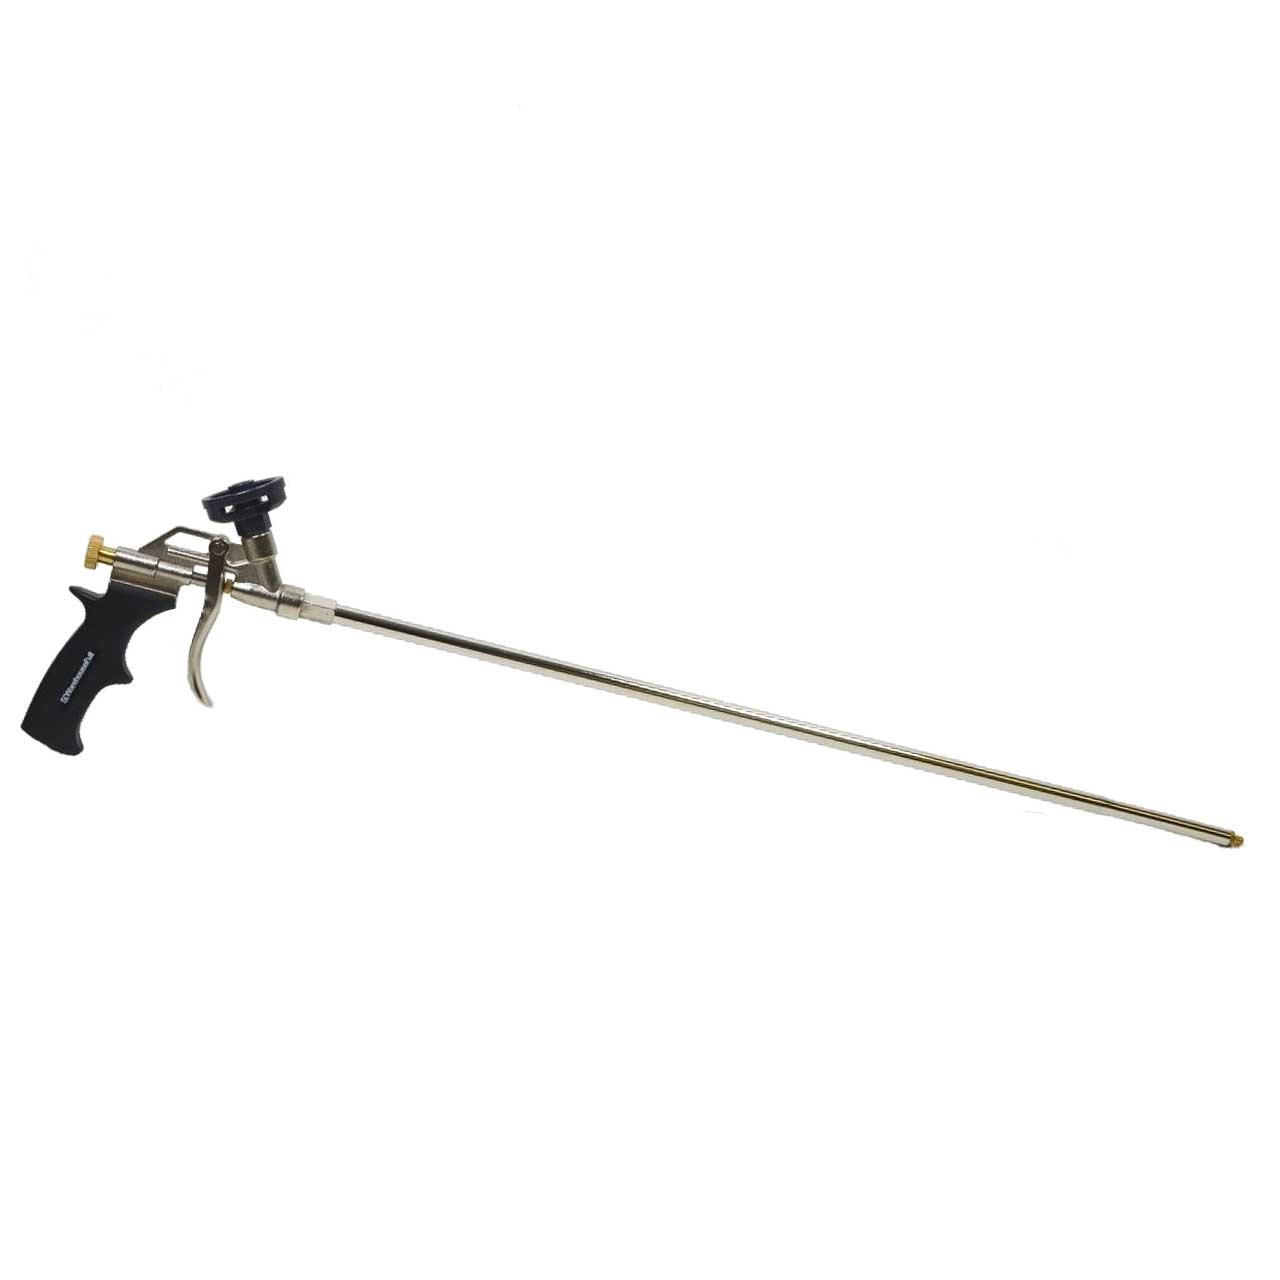 AWAREHOUSEFULL Professional Spray Foam Gun, 2 ft Long Nozzle, AWF-Pro